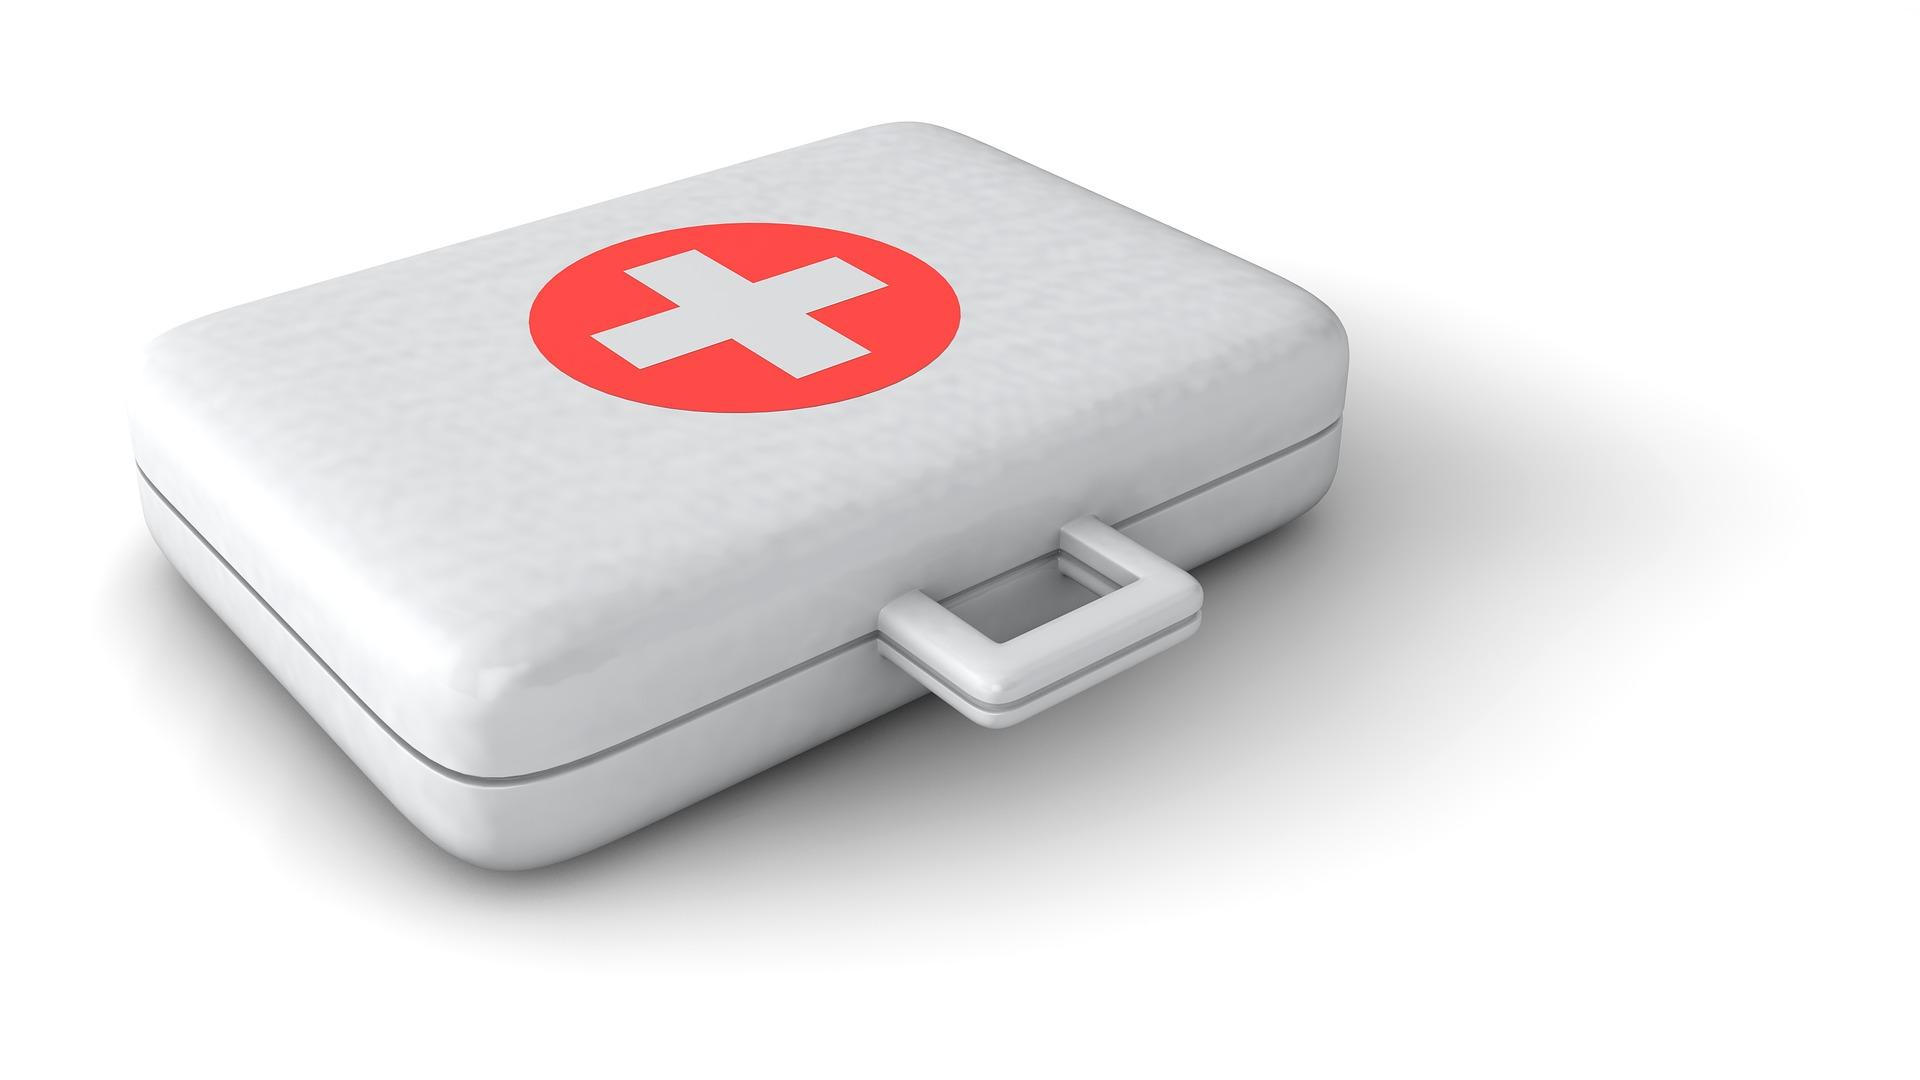 Blutdruck erhöhen - was hilft? - visomat Blutdruckmessgeräte